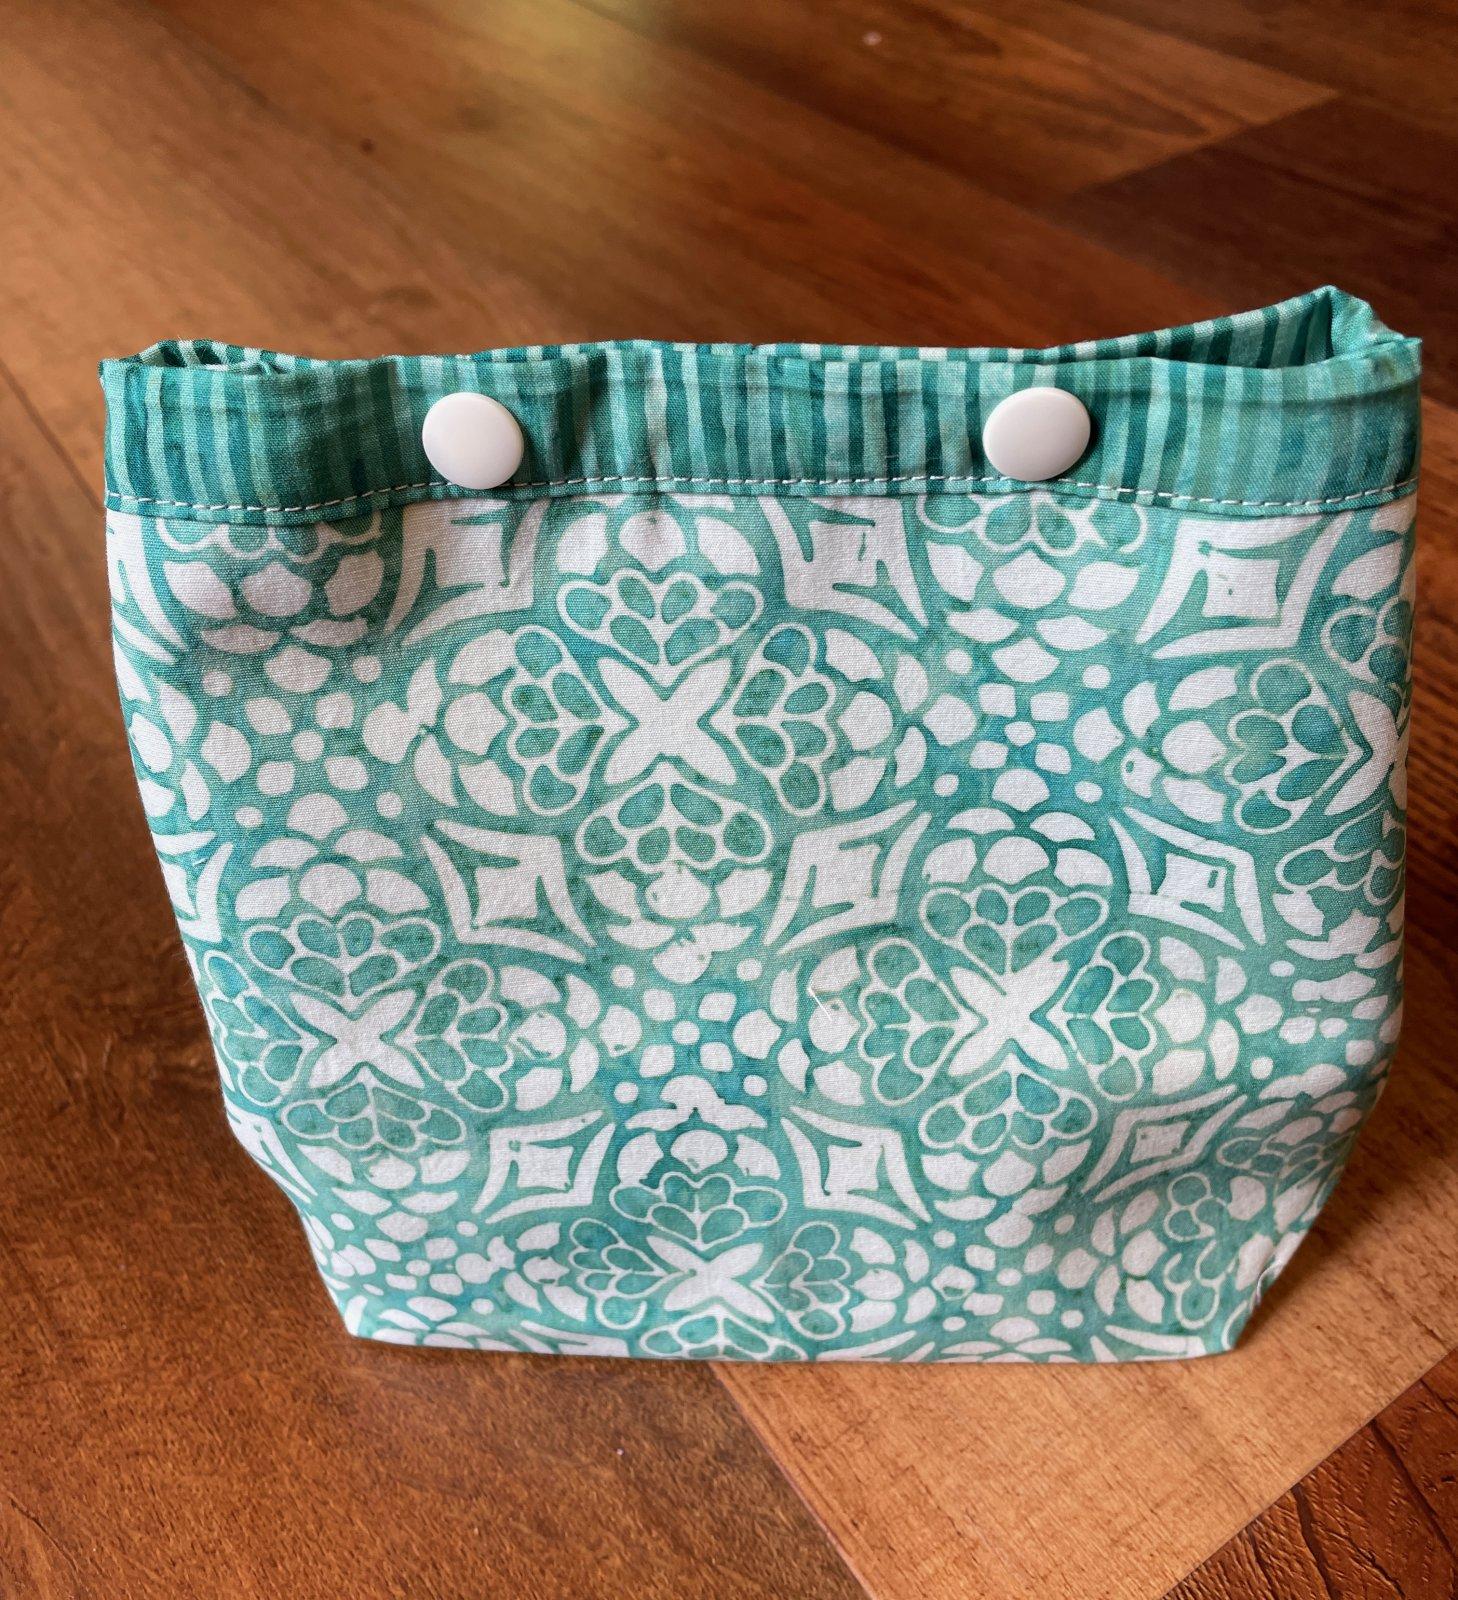 Yarn Ball Bags, by Kim